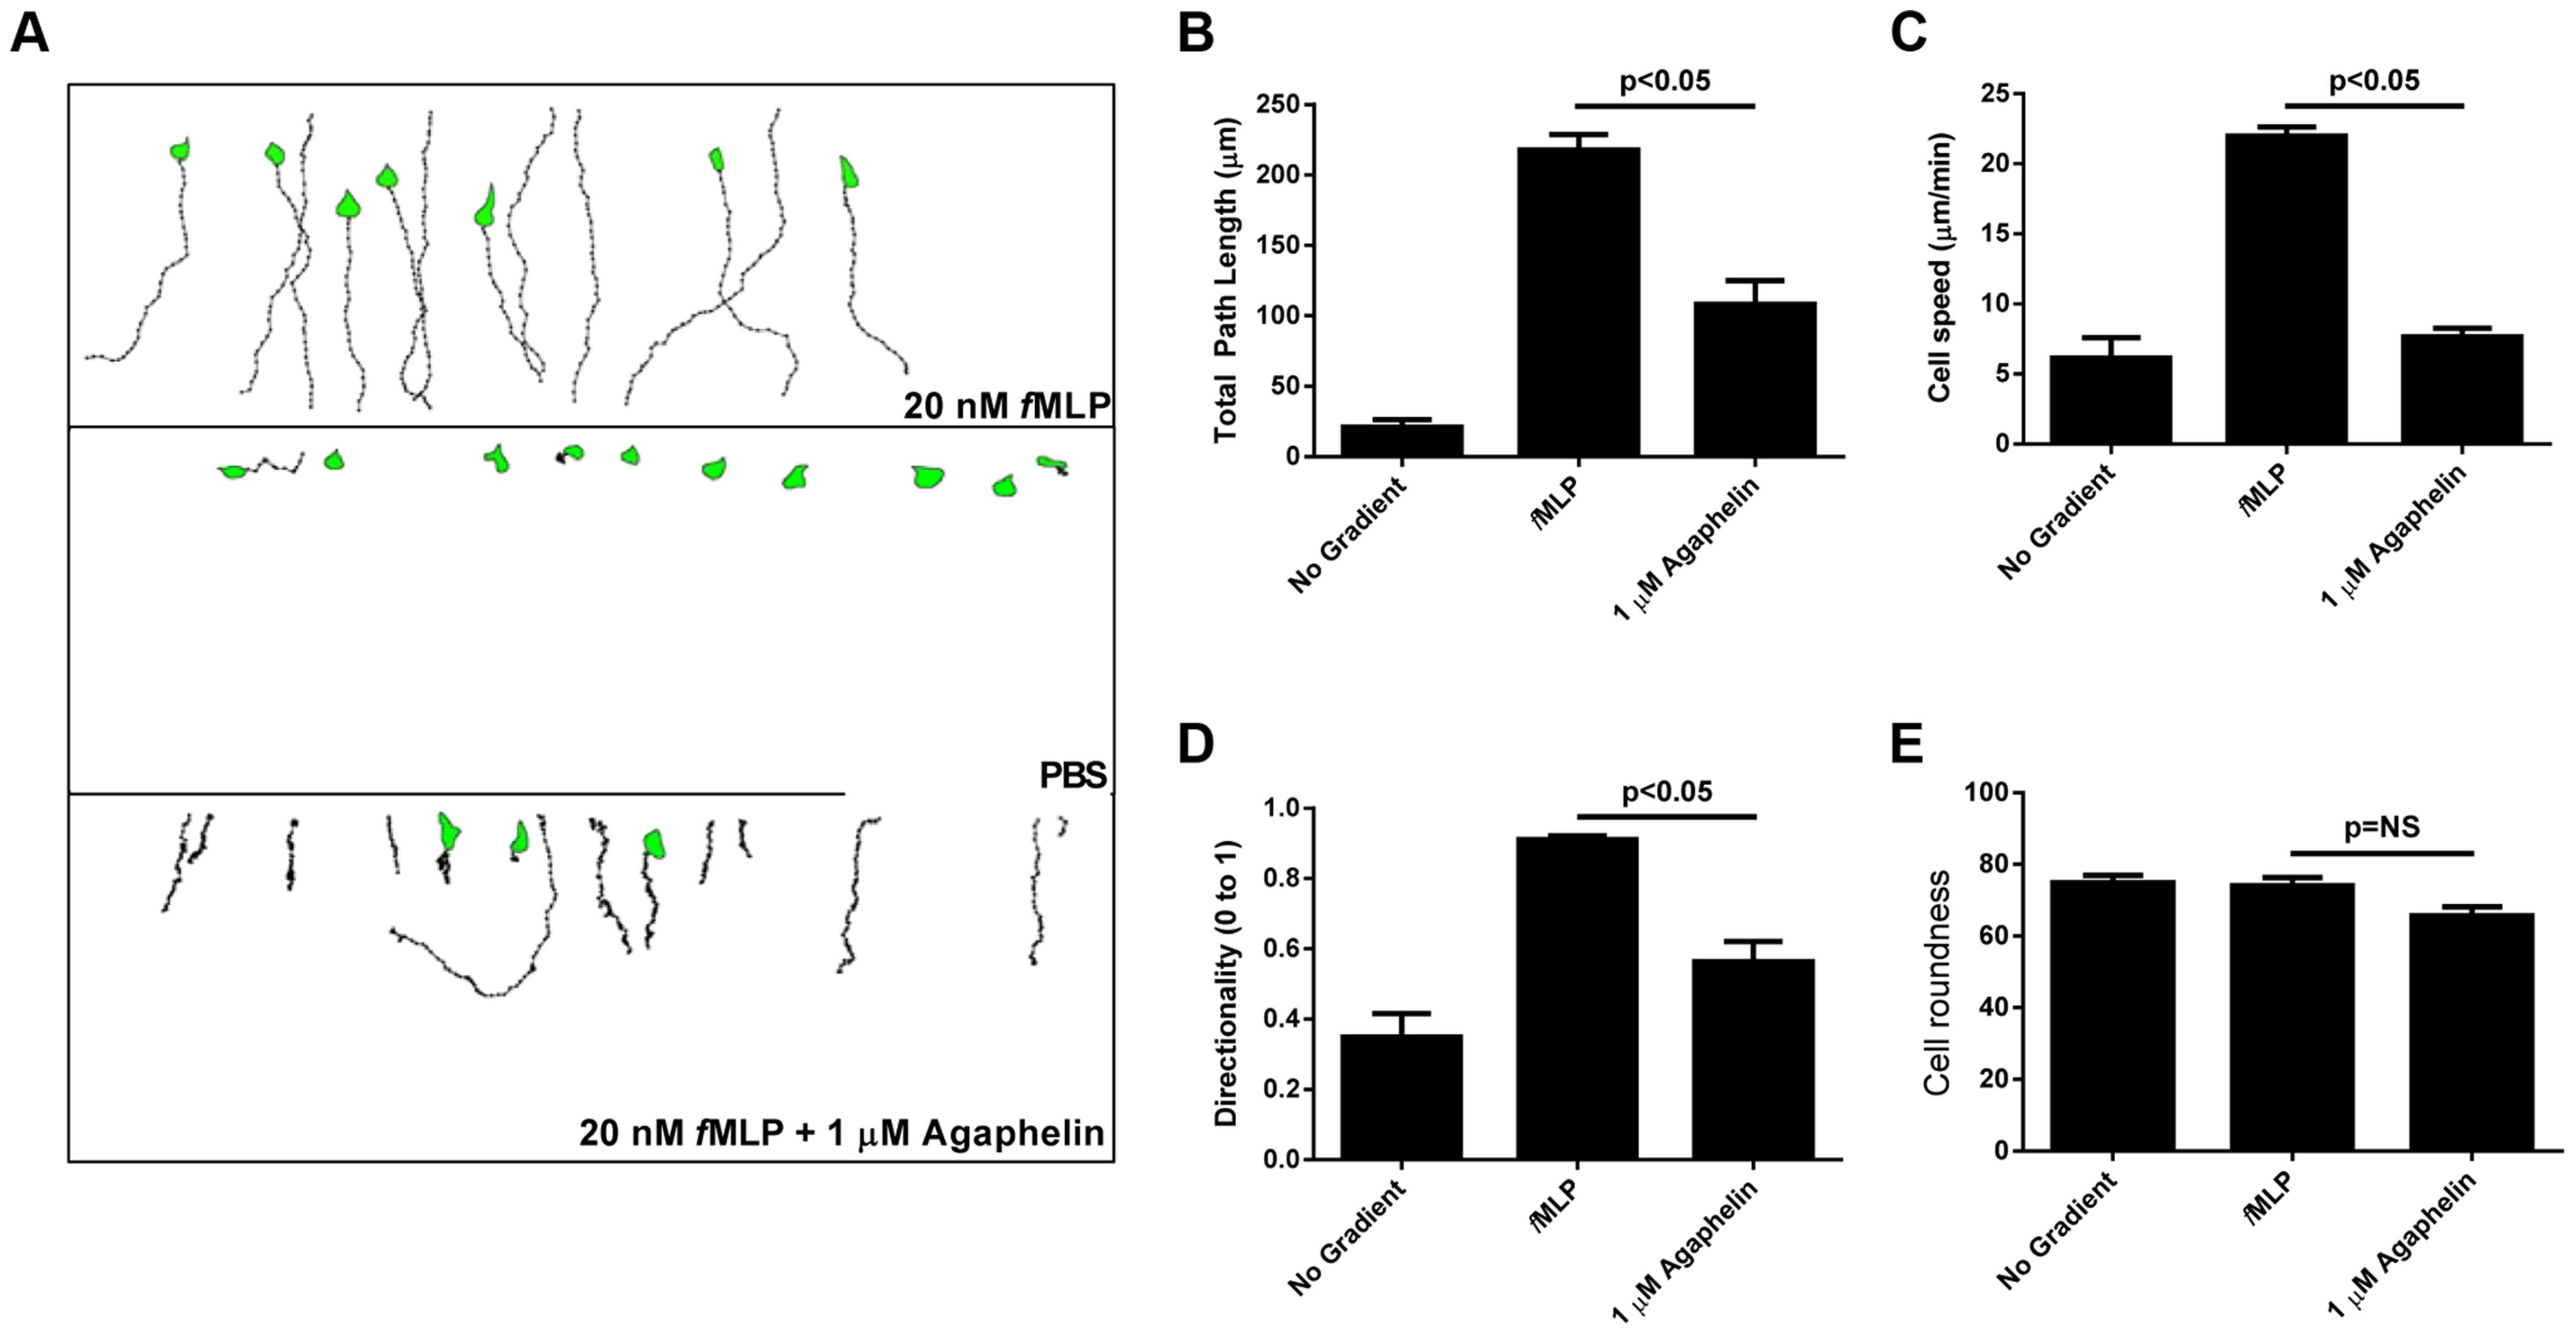 Agaphelin inhibits neutrophil chemotaxis <i>in vitro</i>.